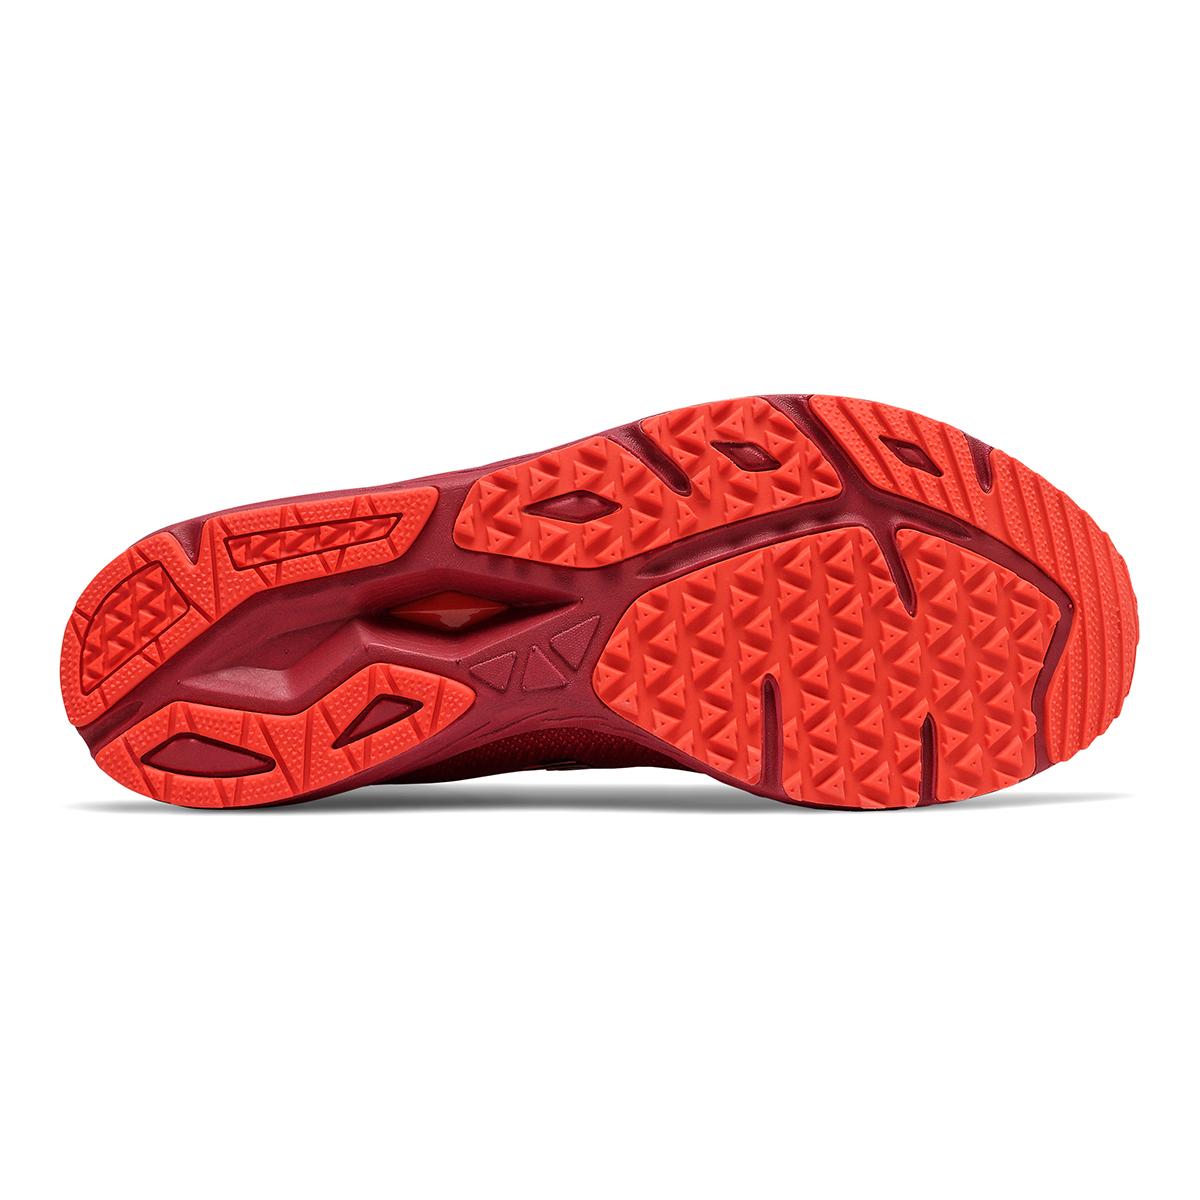 Women's New Balance 1400V6 Running Shoe - Color: Neo Crimson - Size: 5 - Width: Regular, Neo Crimson, large, image 3